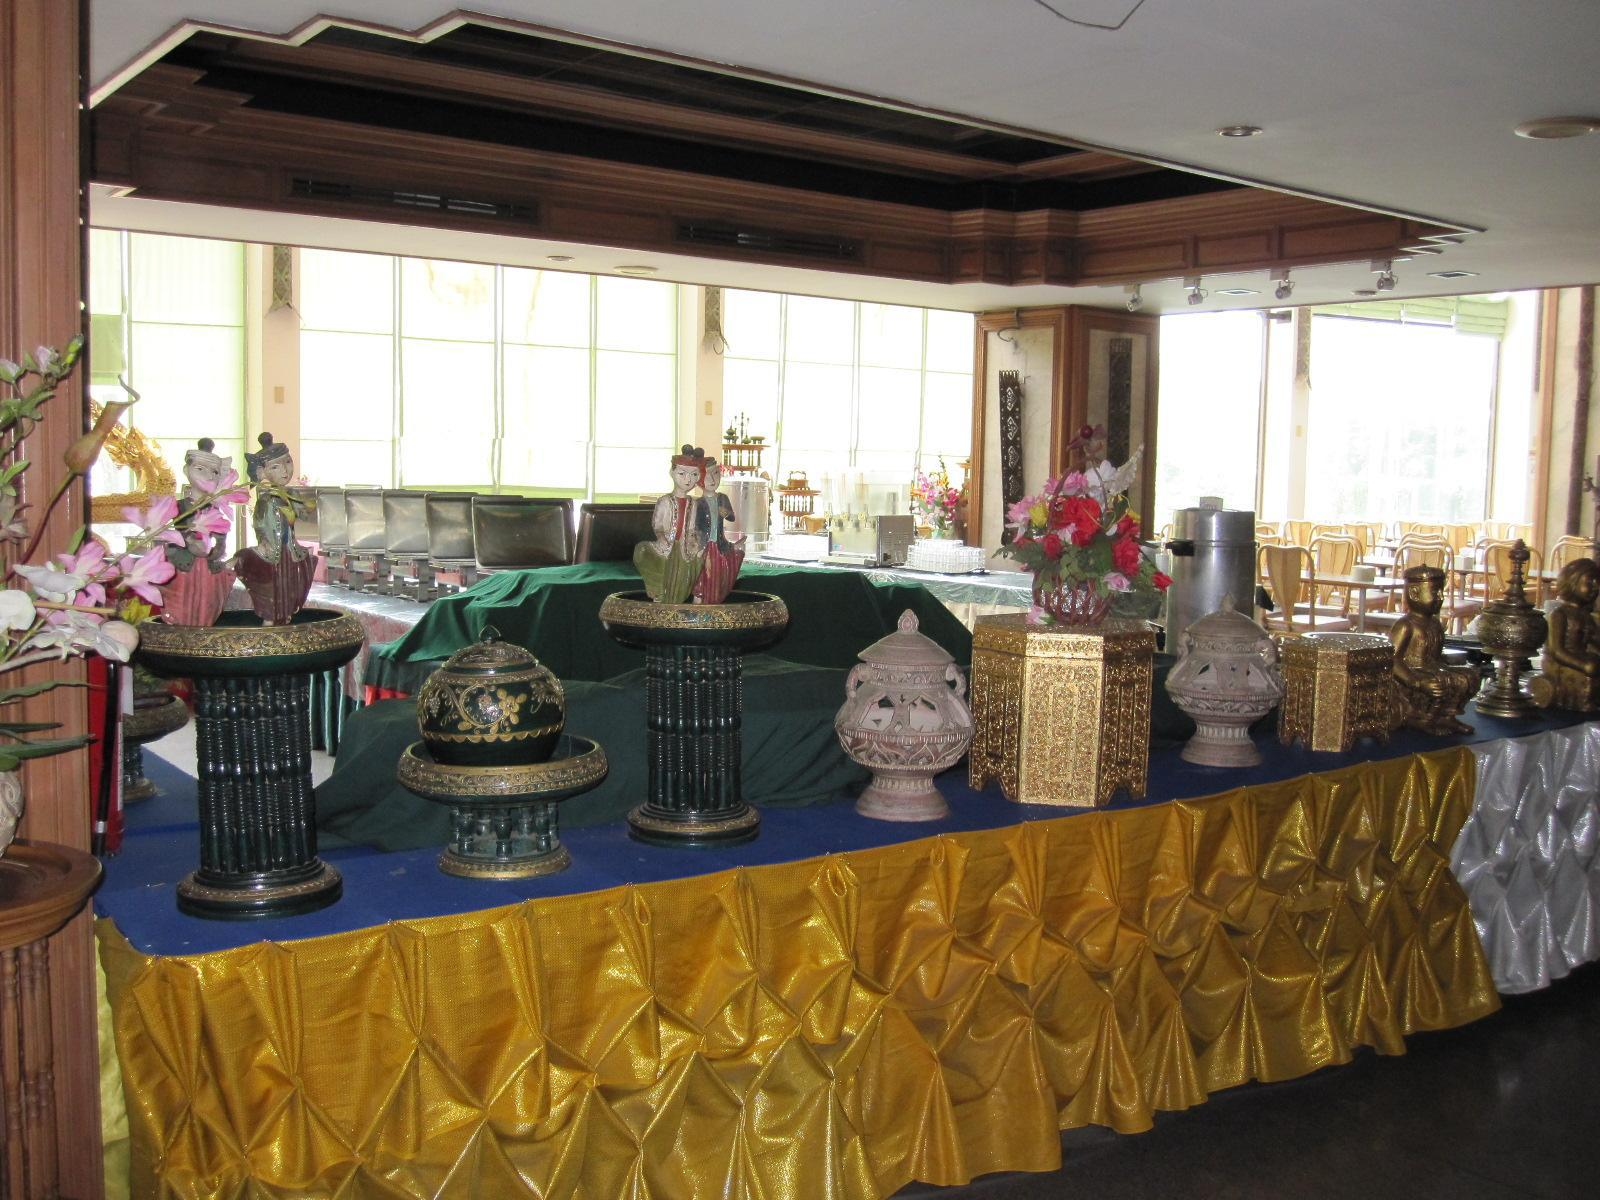 Diamond River Ping Petch-Ngam Hotel โรงแรมไดมอนด์ ริเวอร์ปิง เพชรงาม